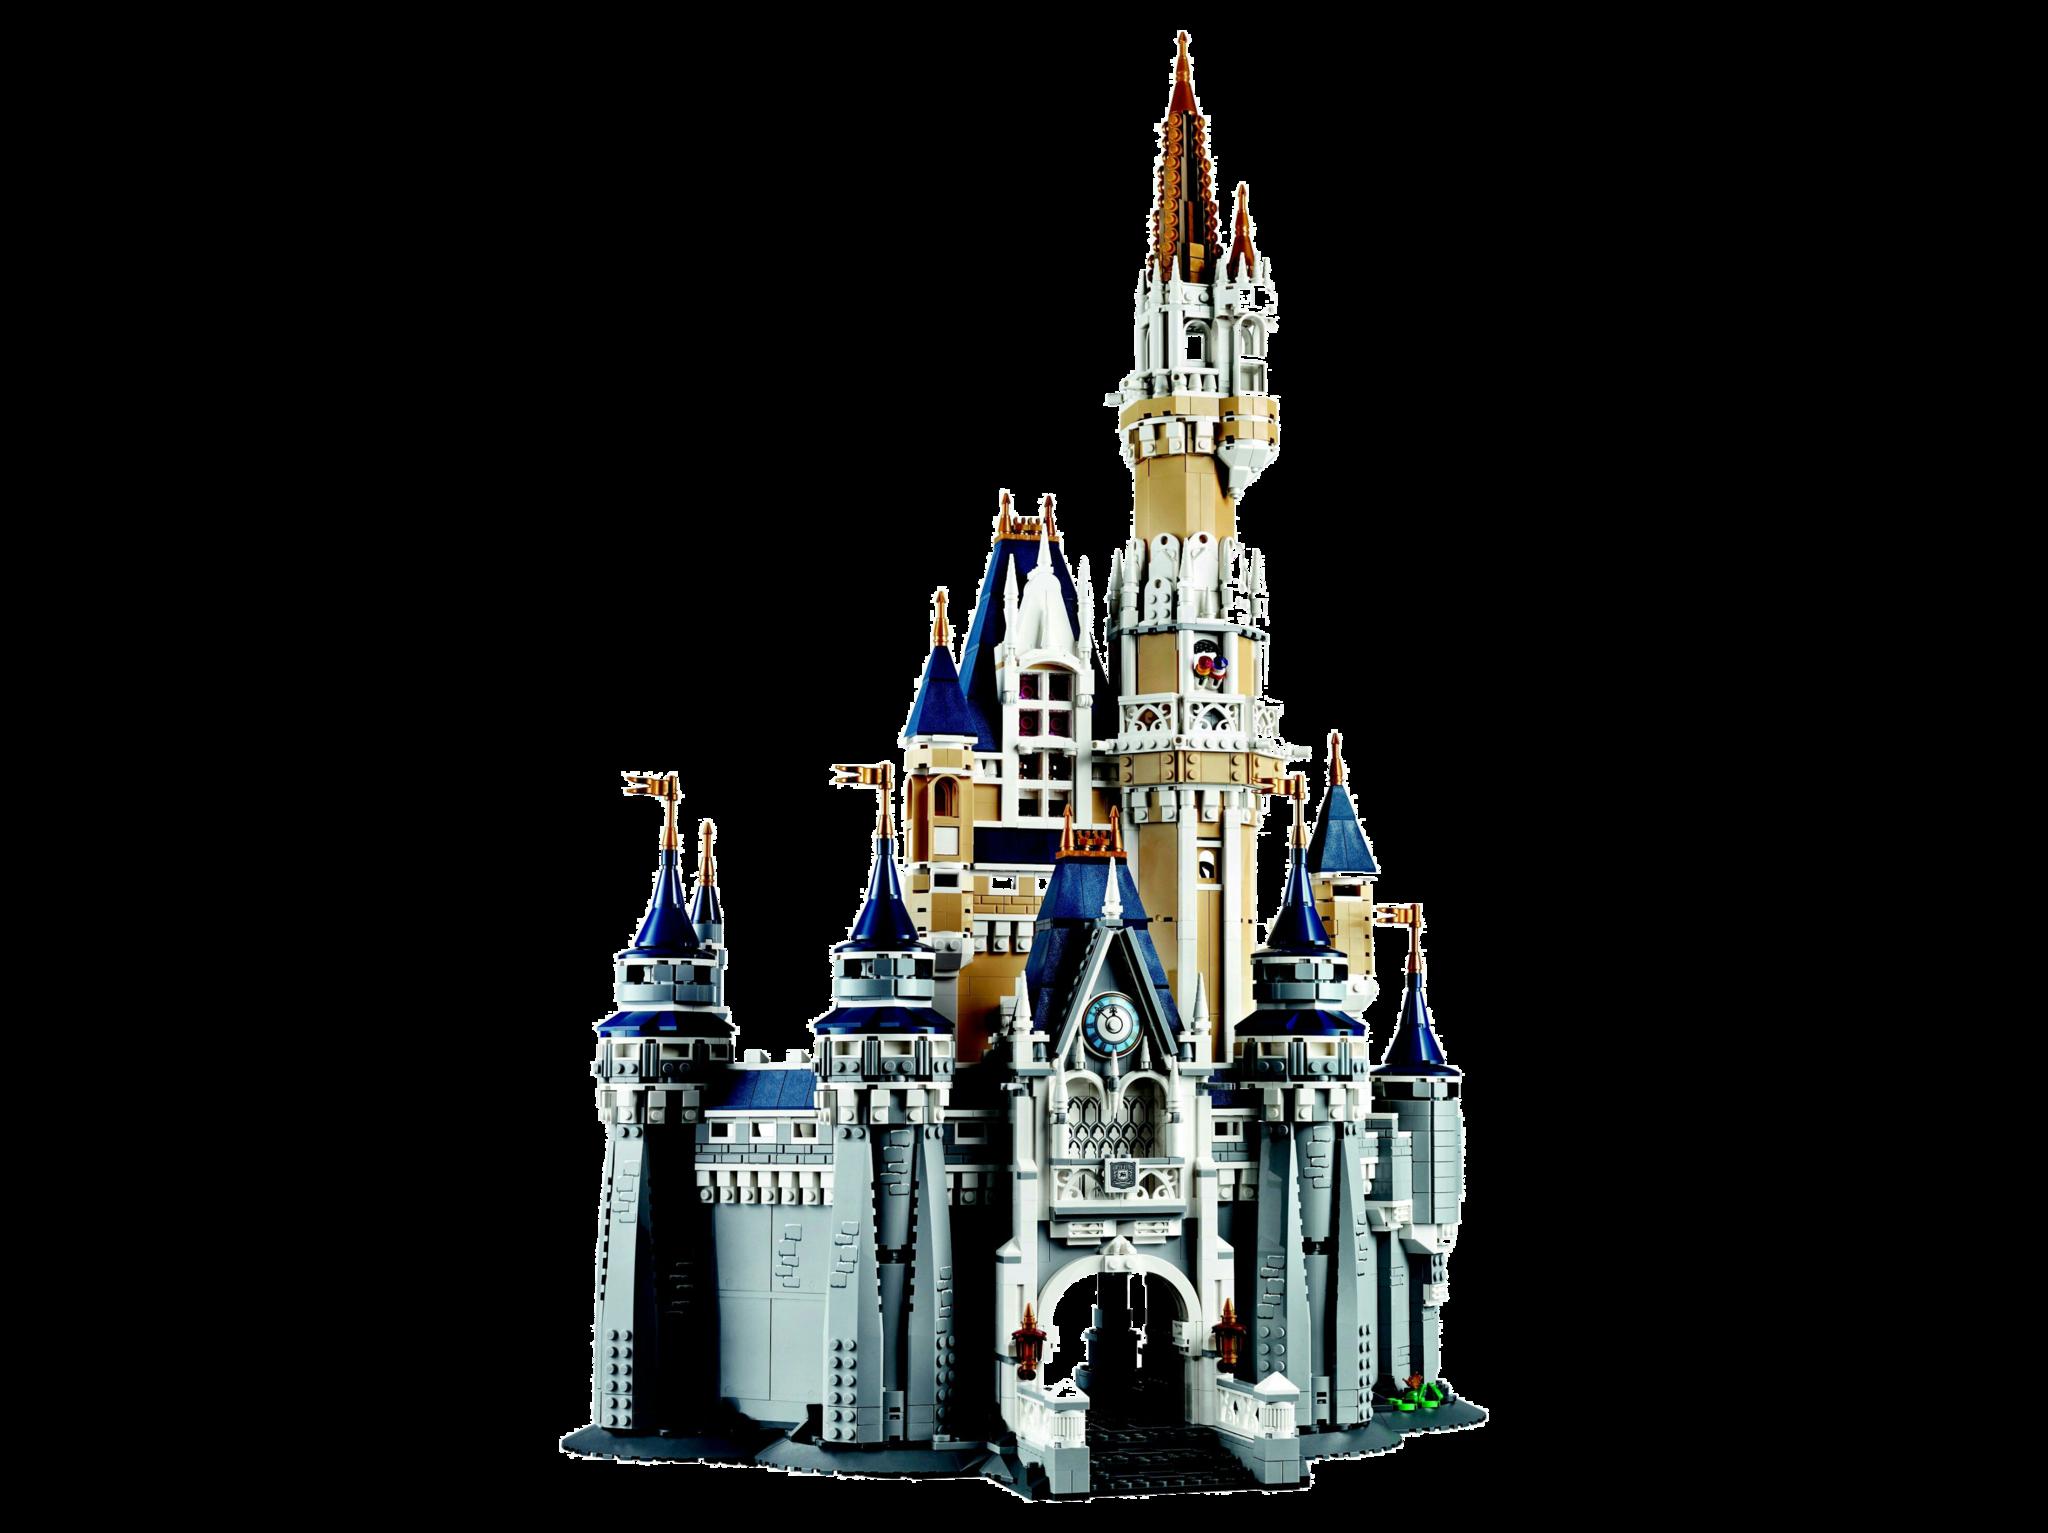 Lego store clipart image black and white stock Magic Kingdom Disneyland Paris Cinderella Castle The LEGO ... image black and white stock